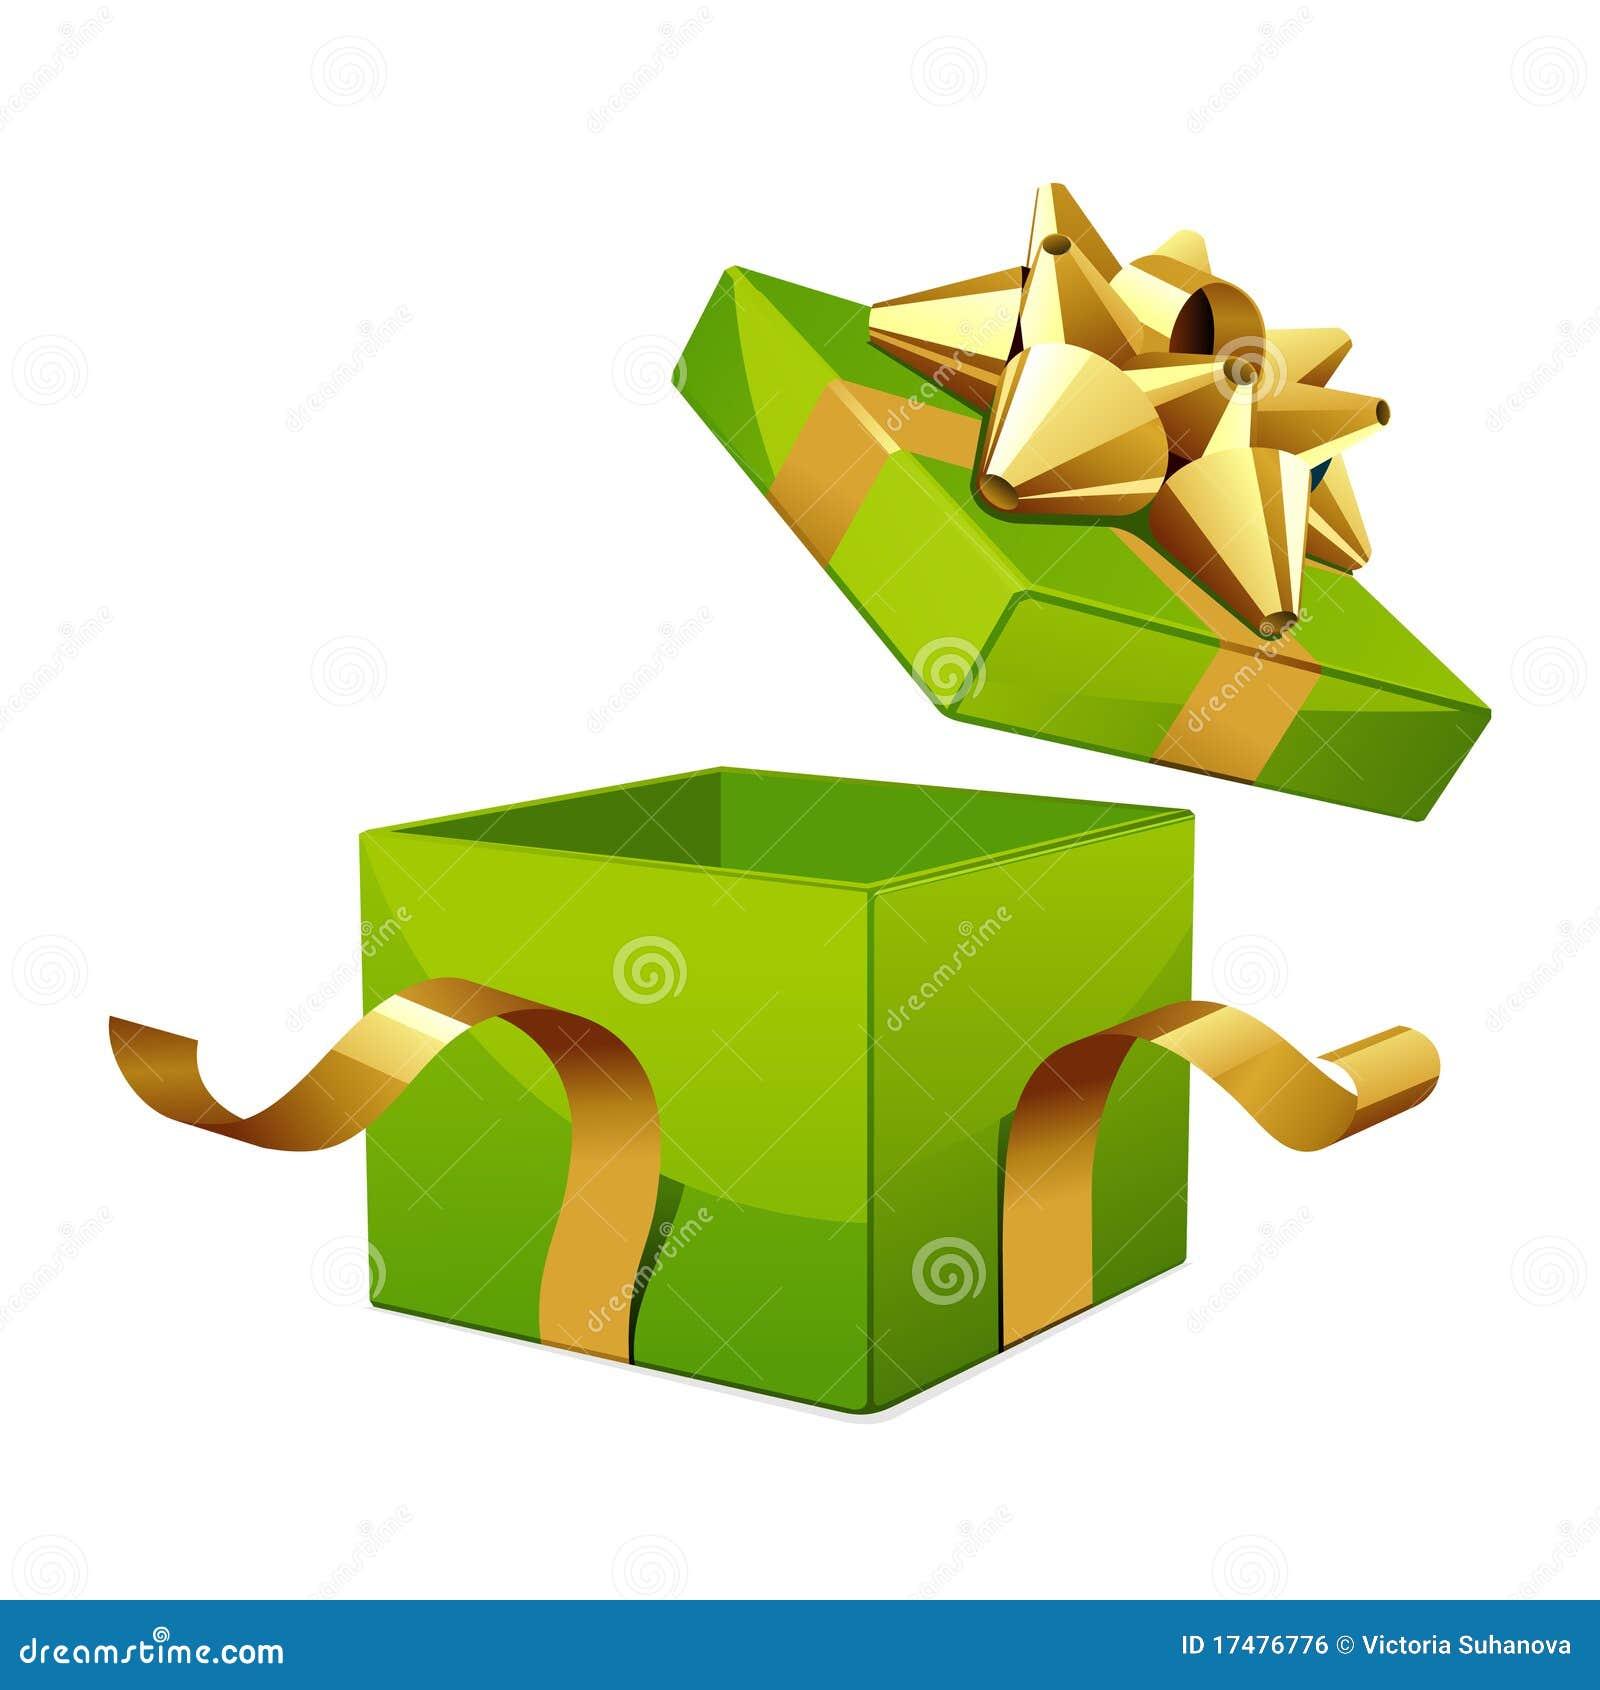 Christmas Open Gift Box - Download Free Vectors, Clipart Graphics & Vector  Art